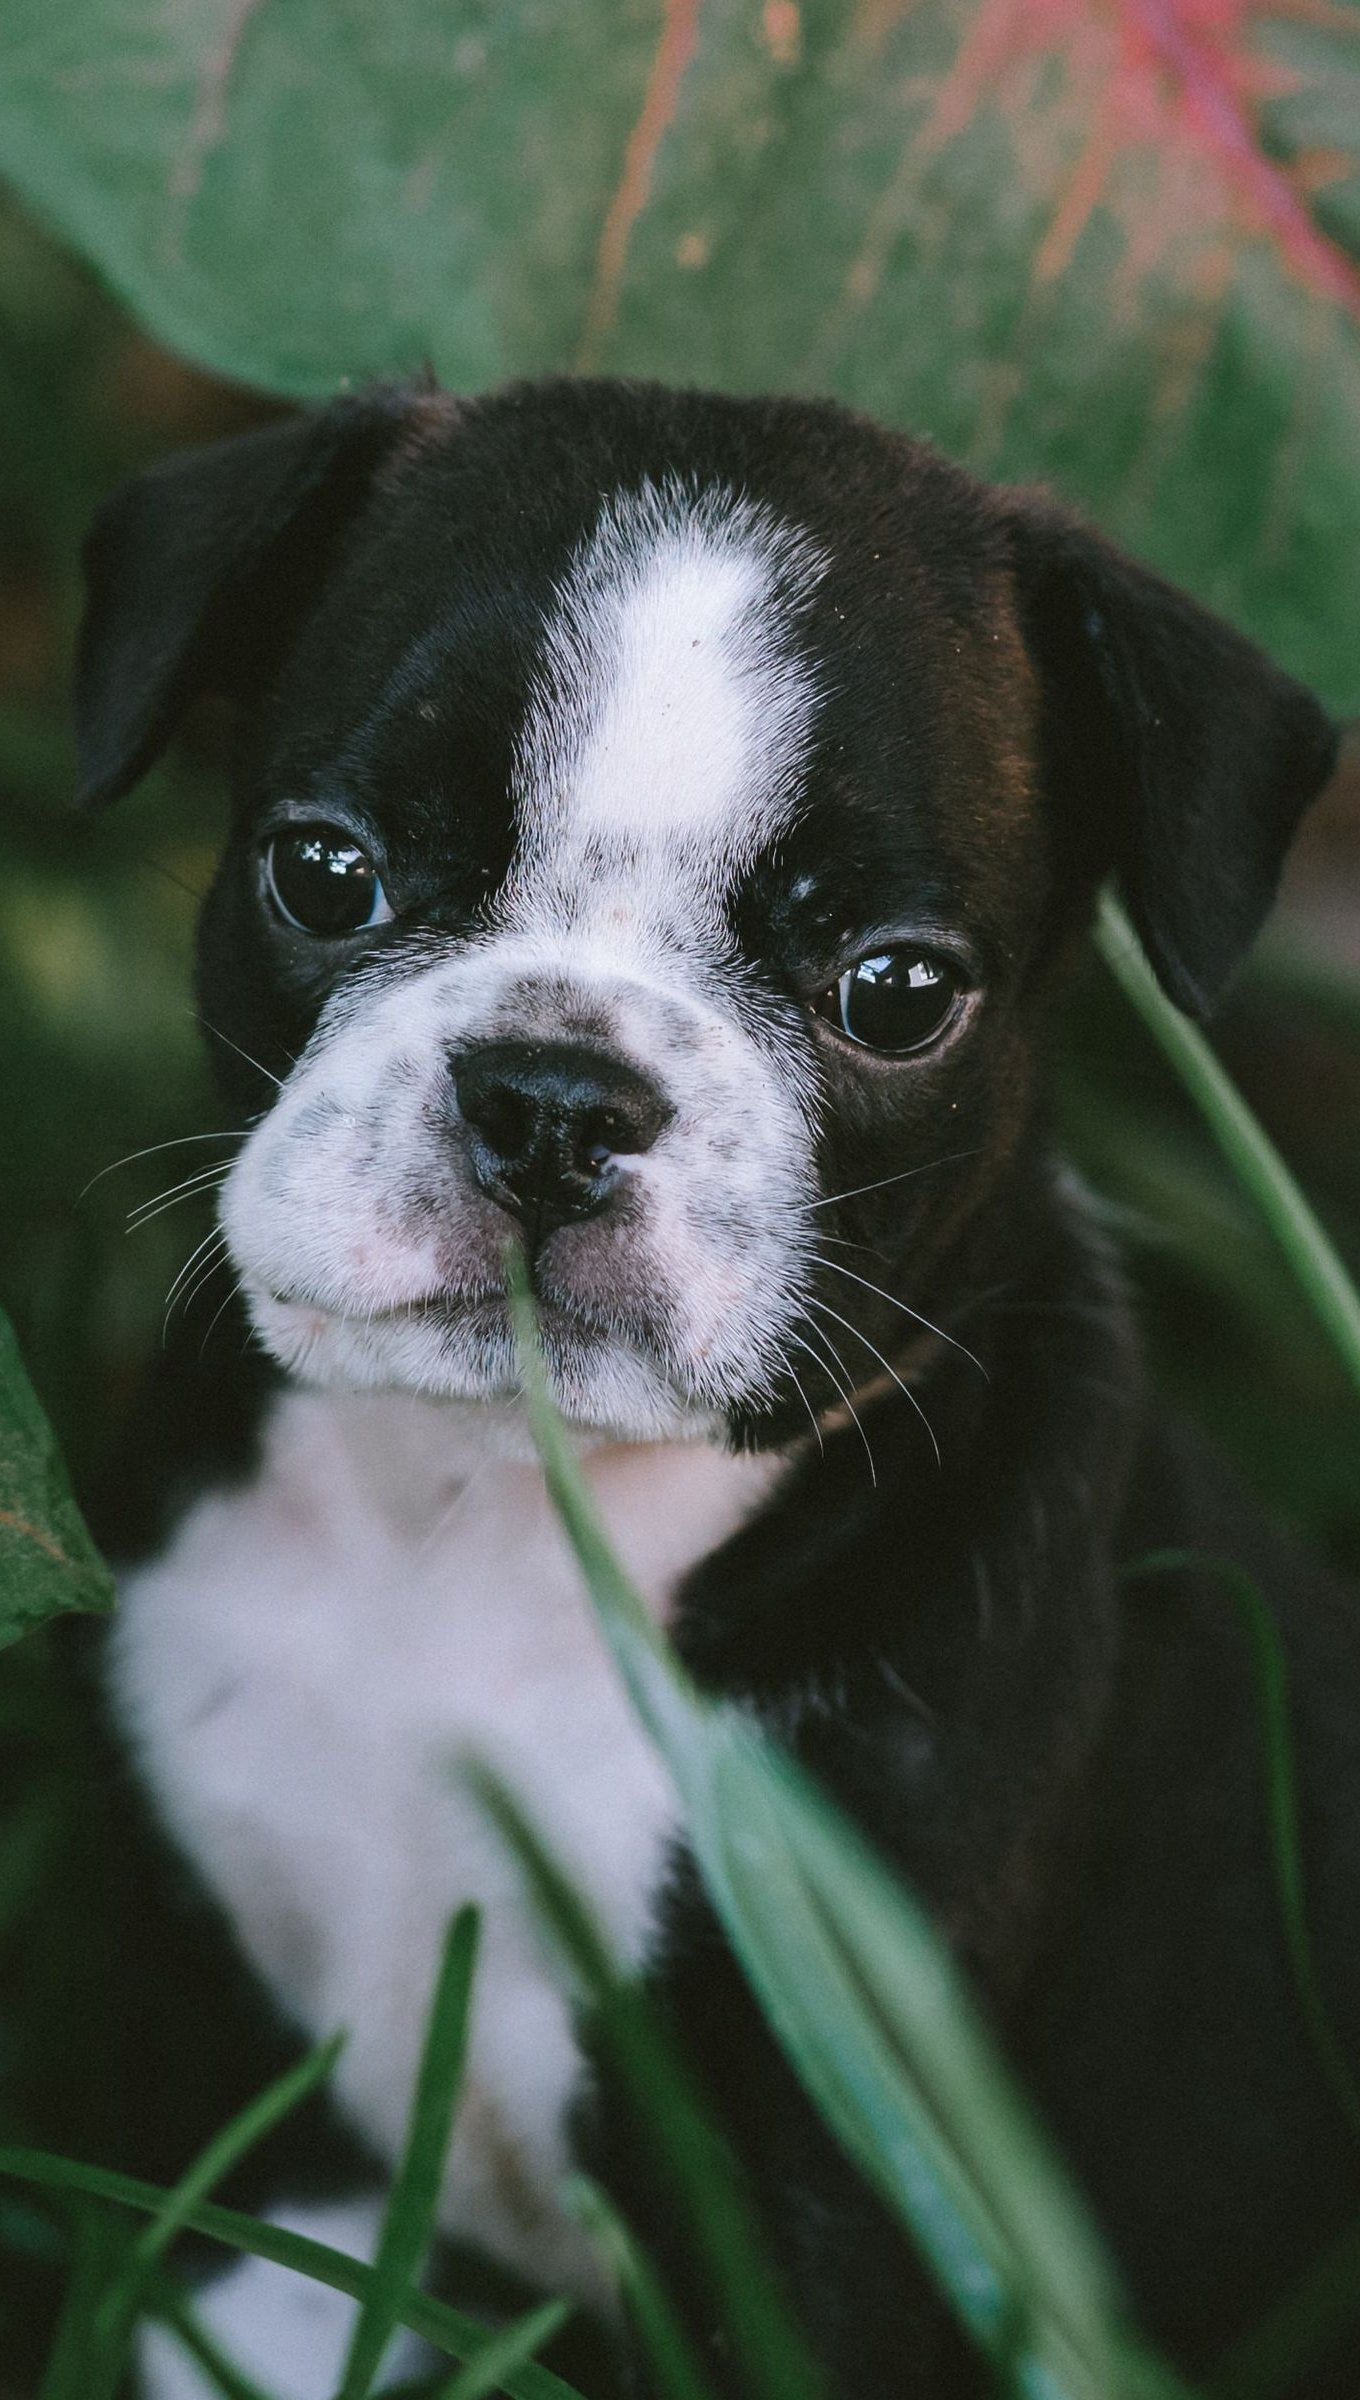 Fondos de pantalla Cachorro en jardín Vertical